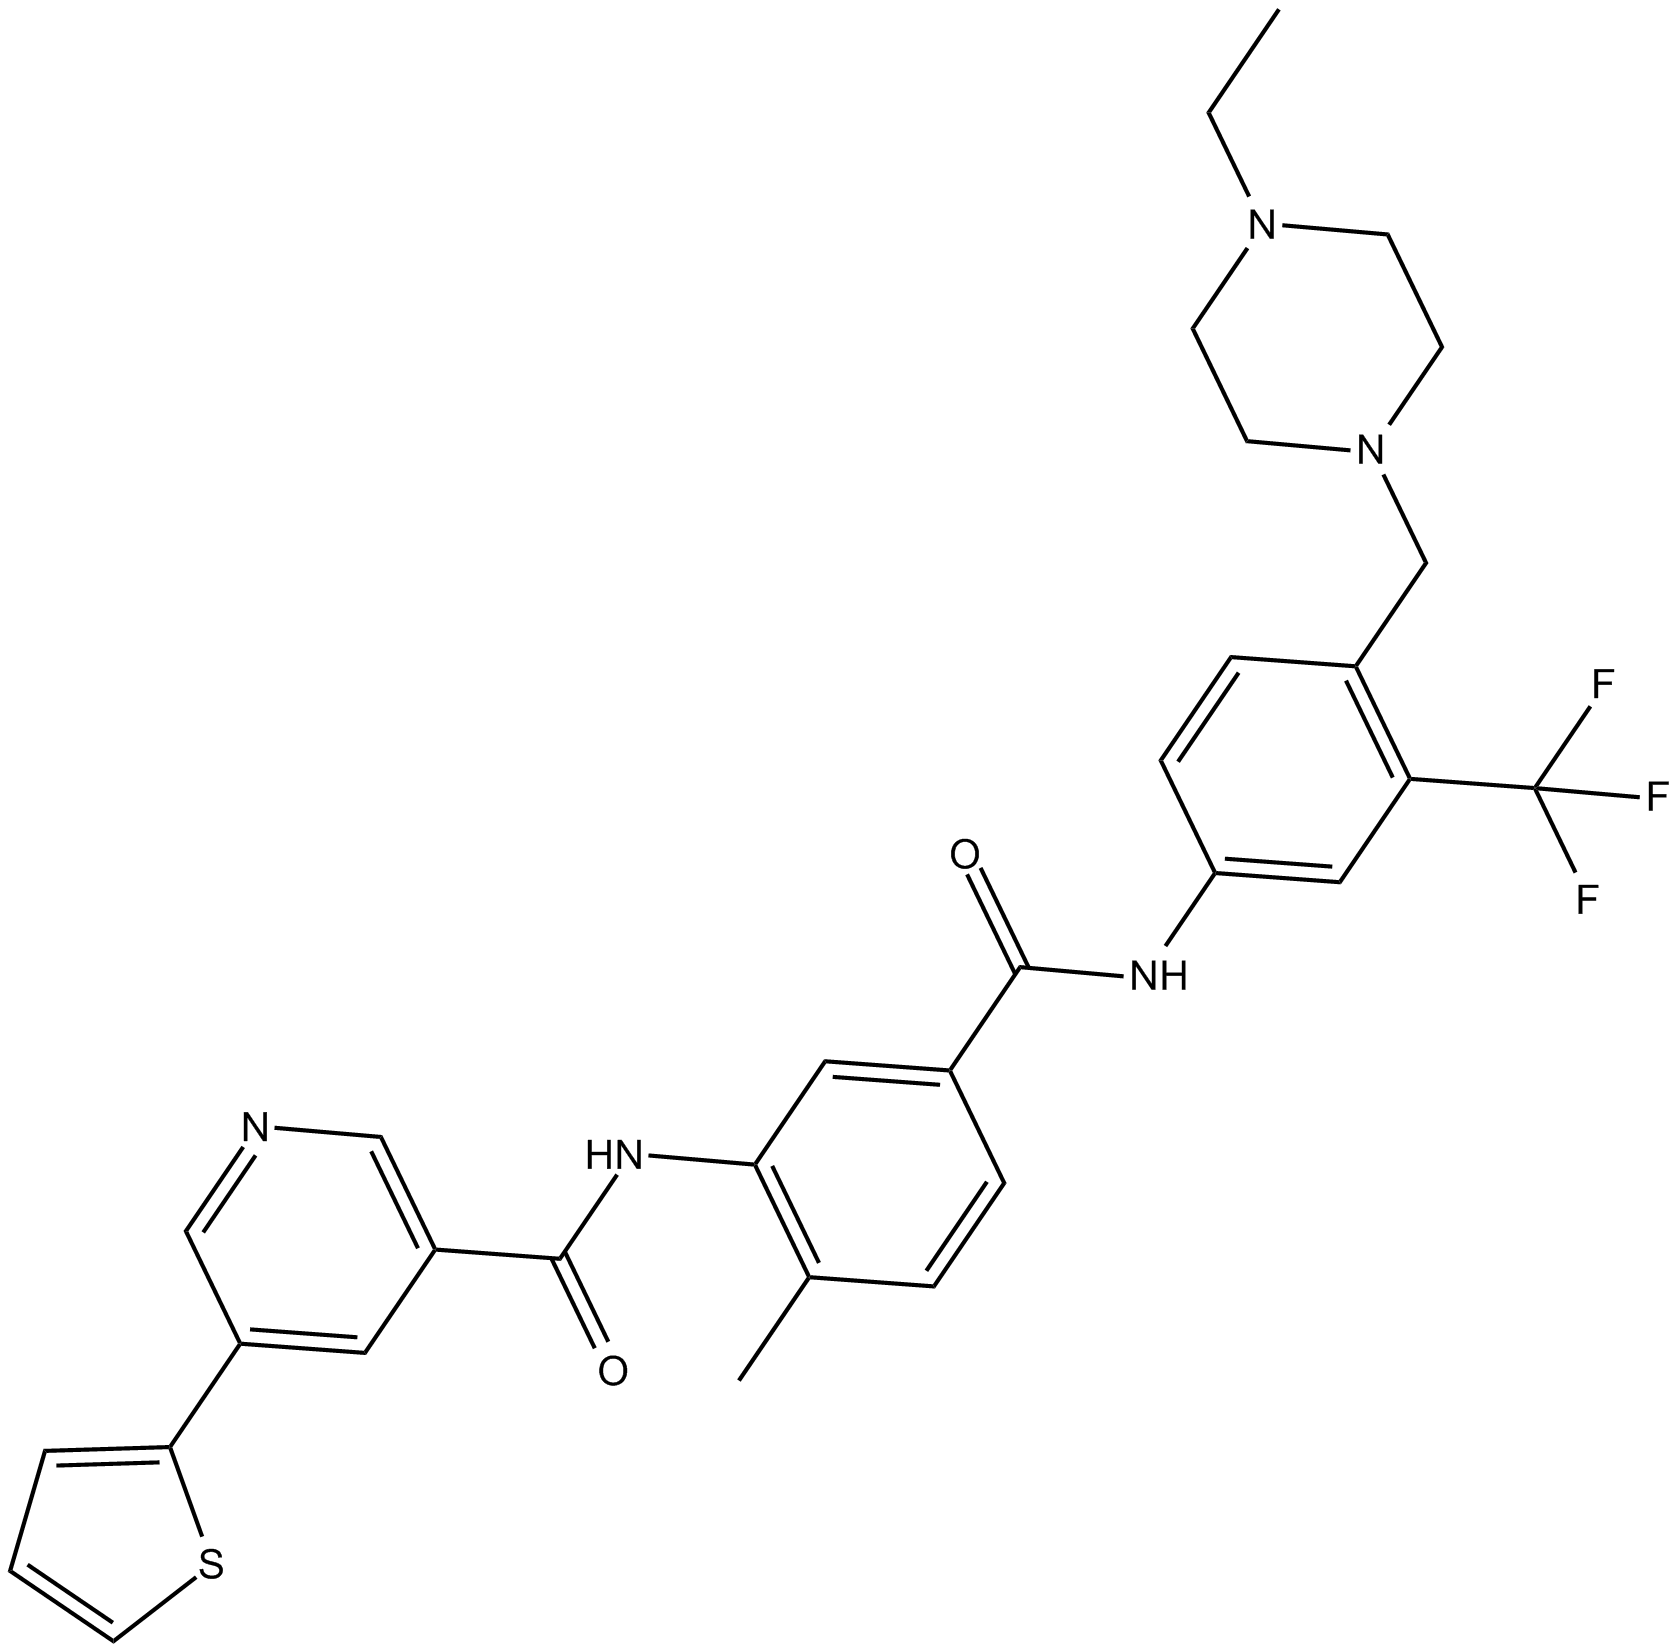 APExBIO - ALW-II-41-27 Eph receptor inhibitor CAS# 1186206-79-0